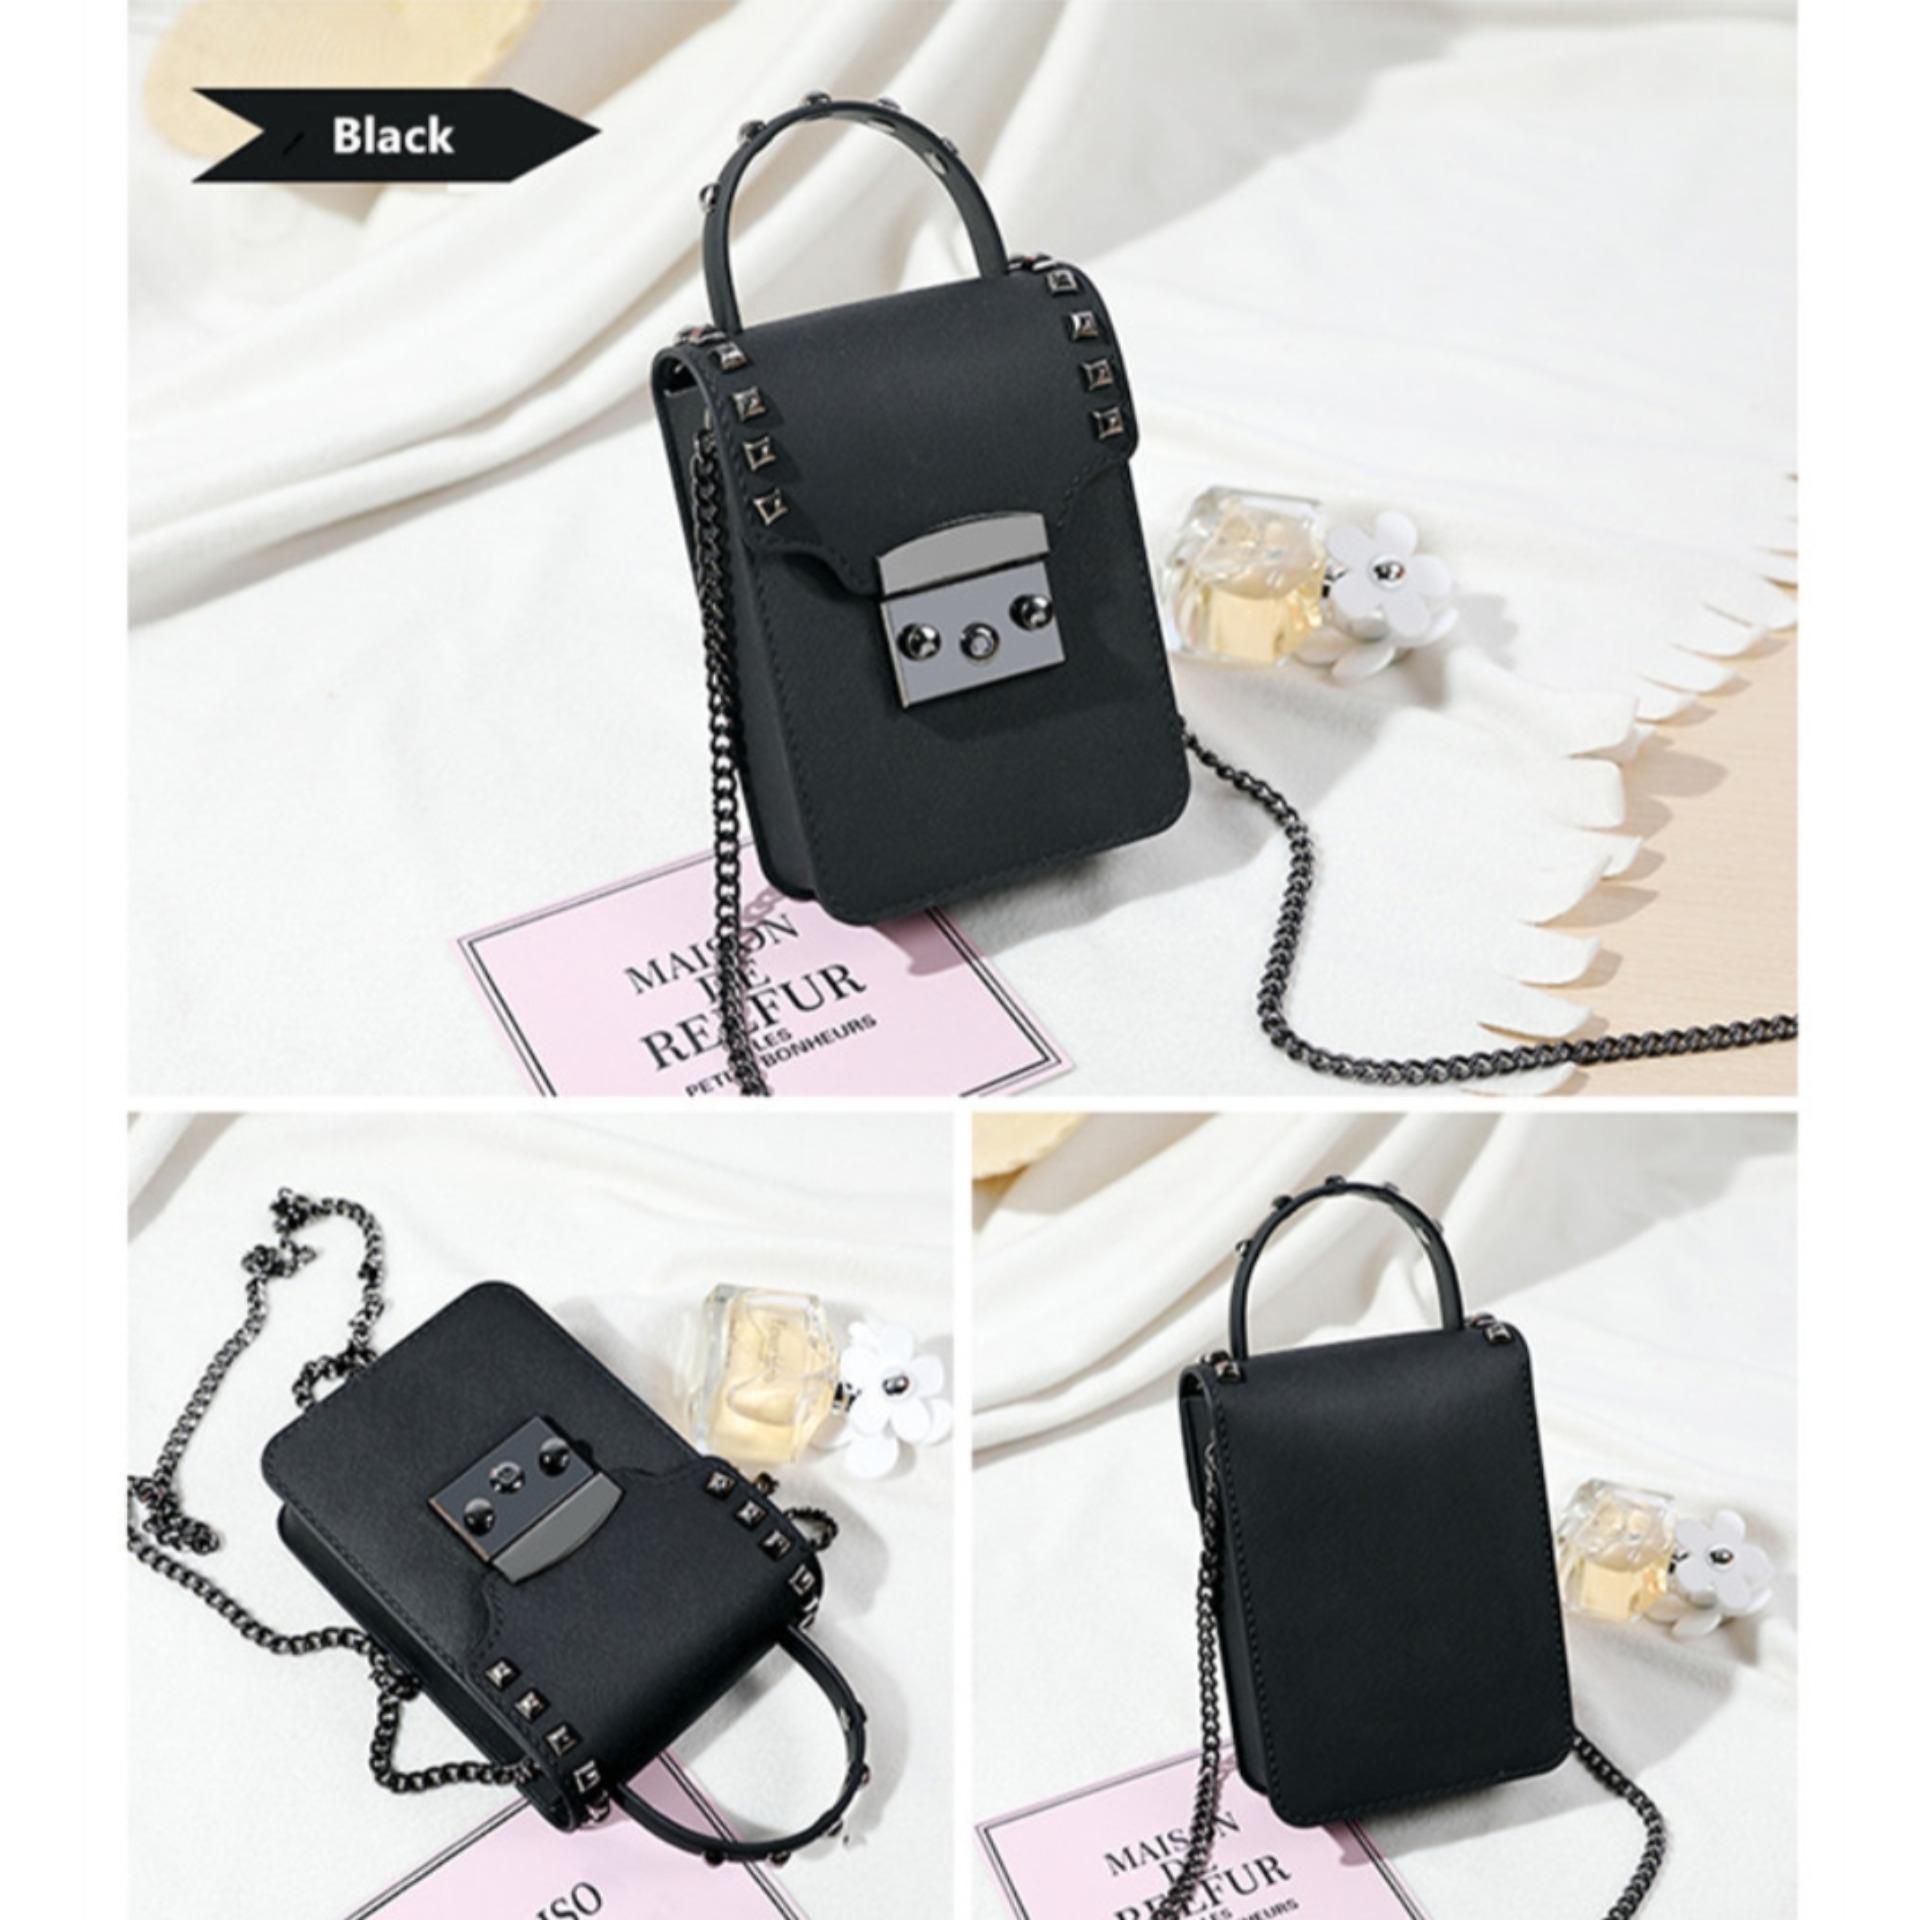 Fashionity New Mini messenger Bag - Jelly Pouch - Tas Wanita -  Tas Mini Jelly